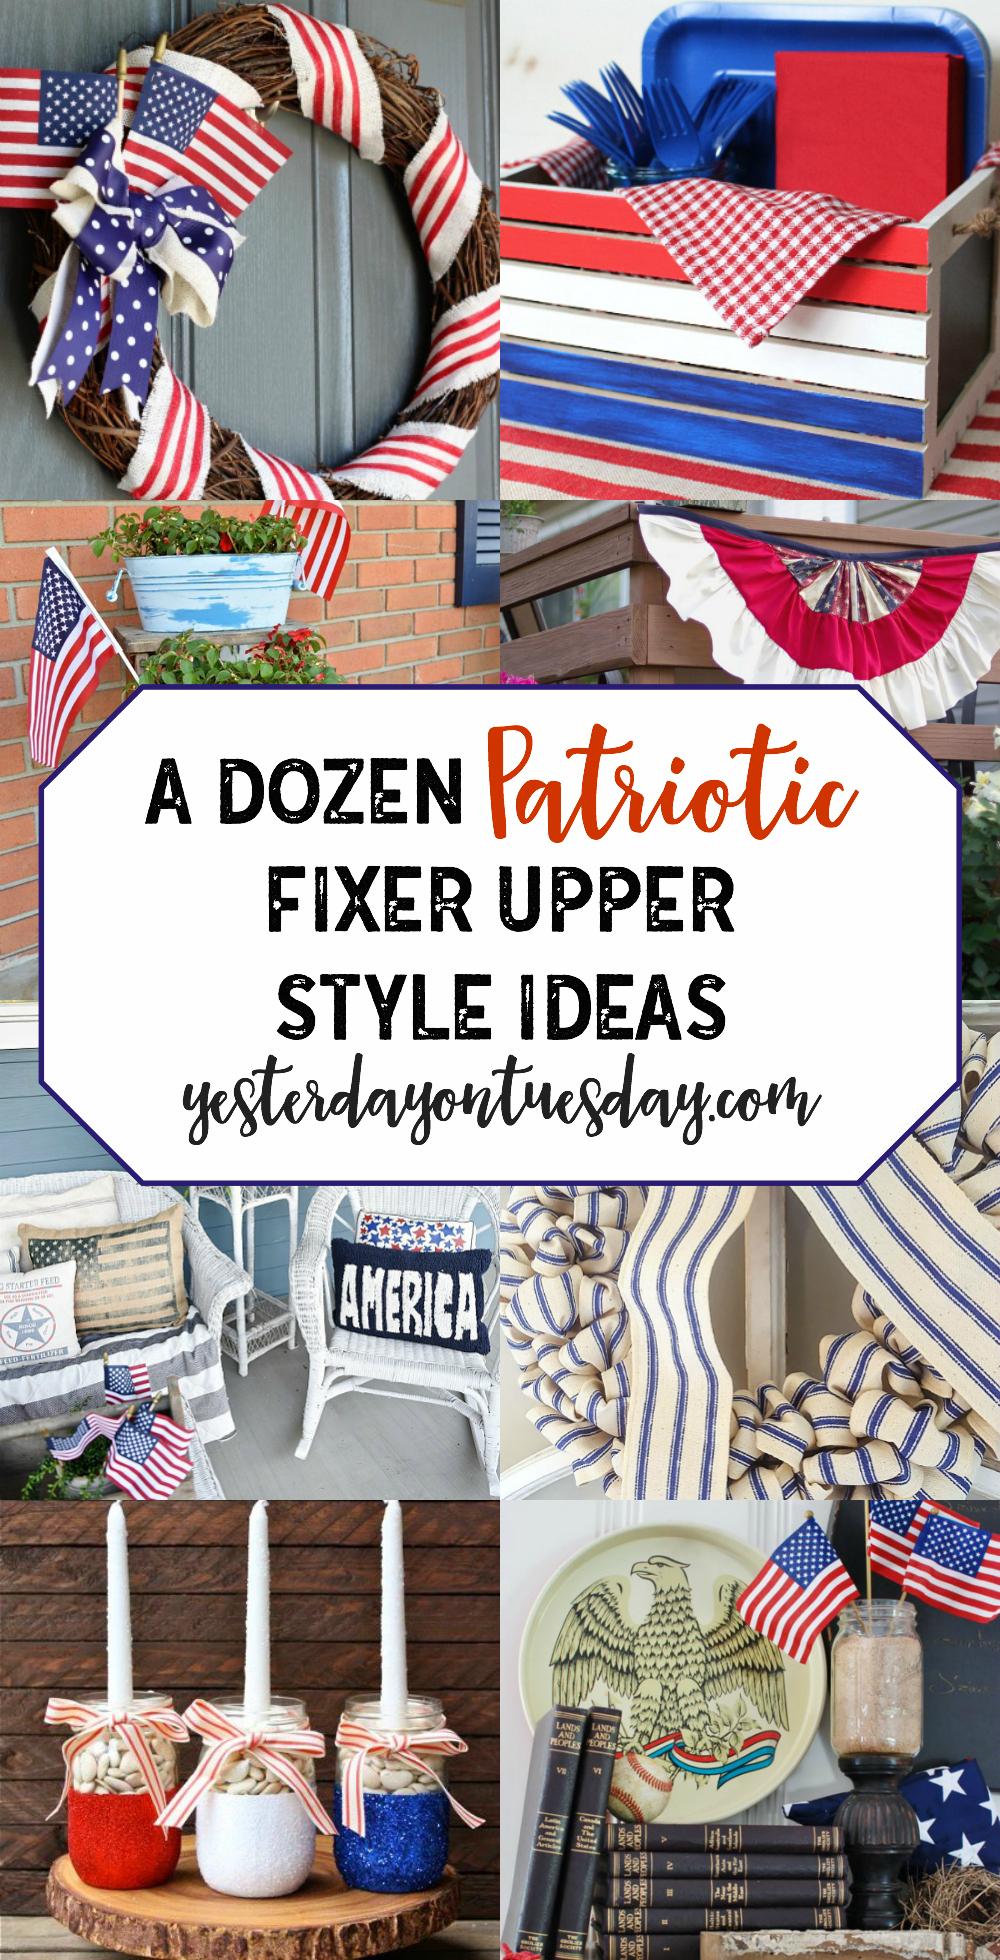 A Dozen Patriotic Fixer Upper Style Ideas